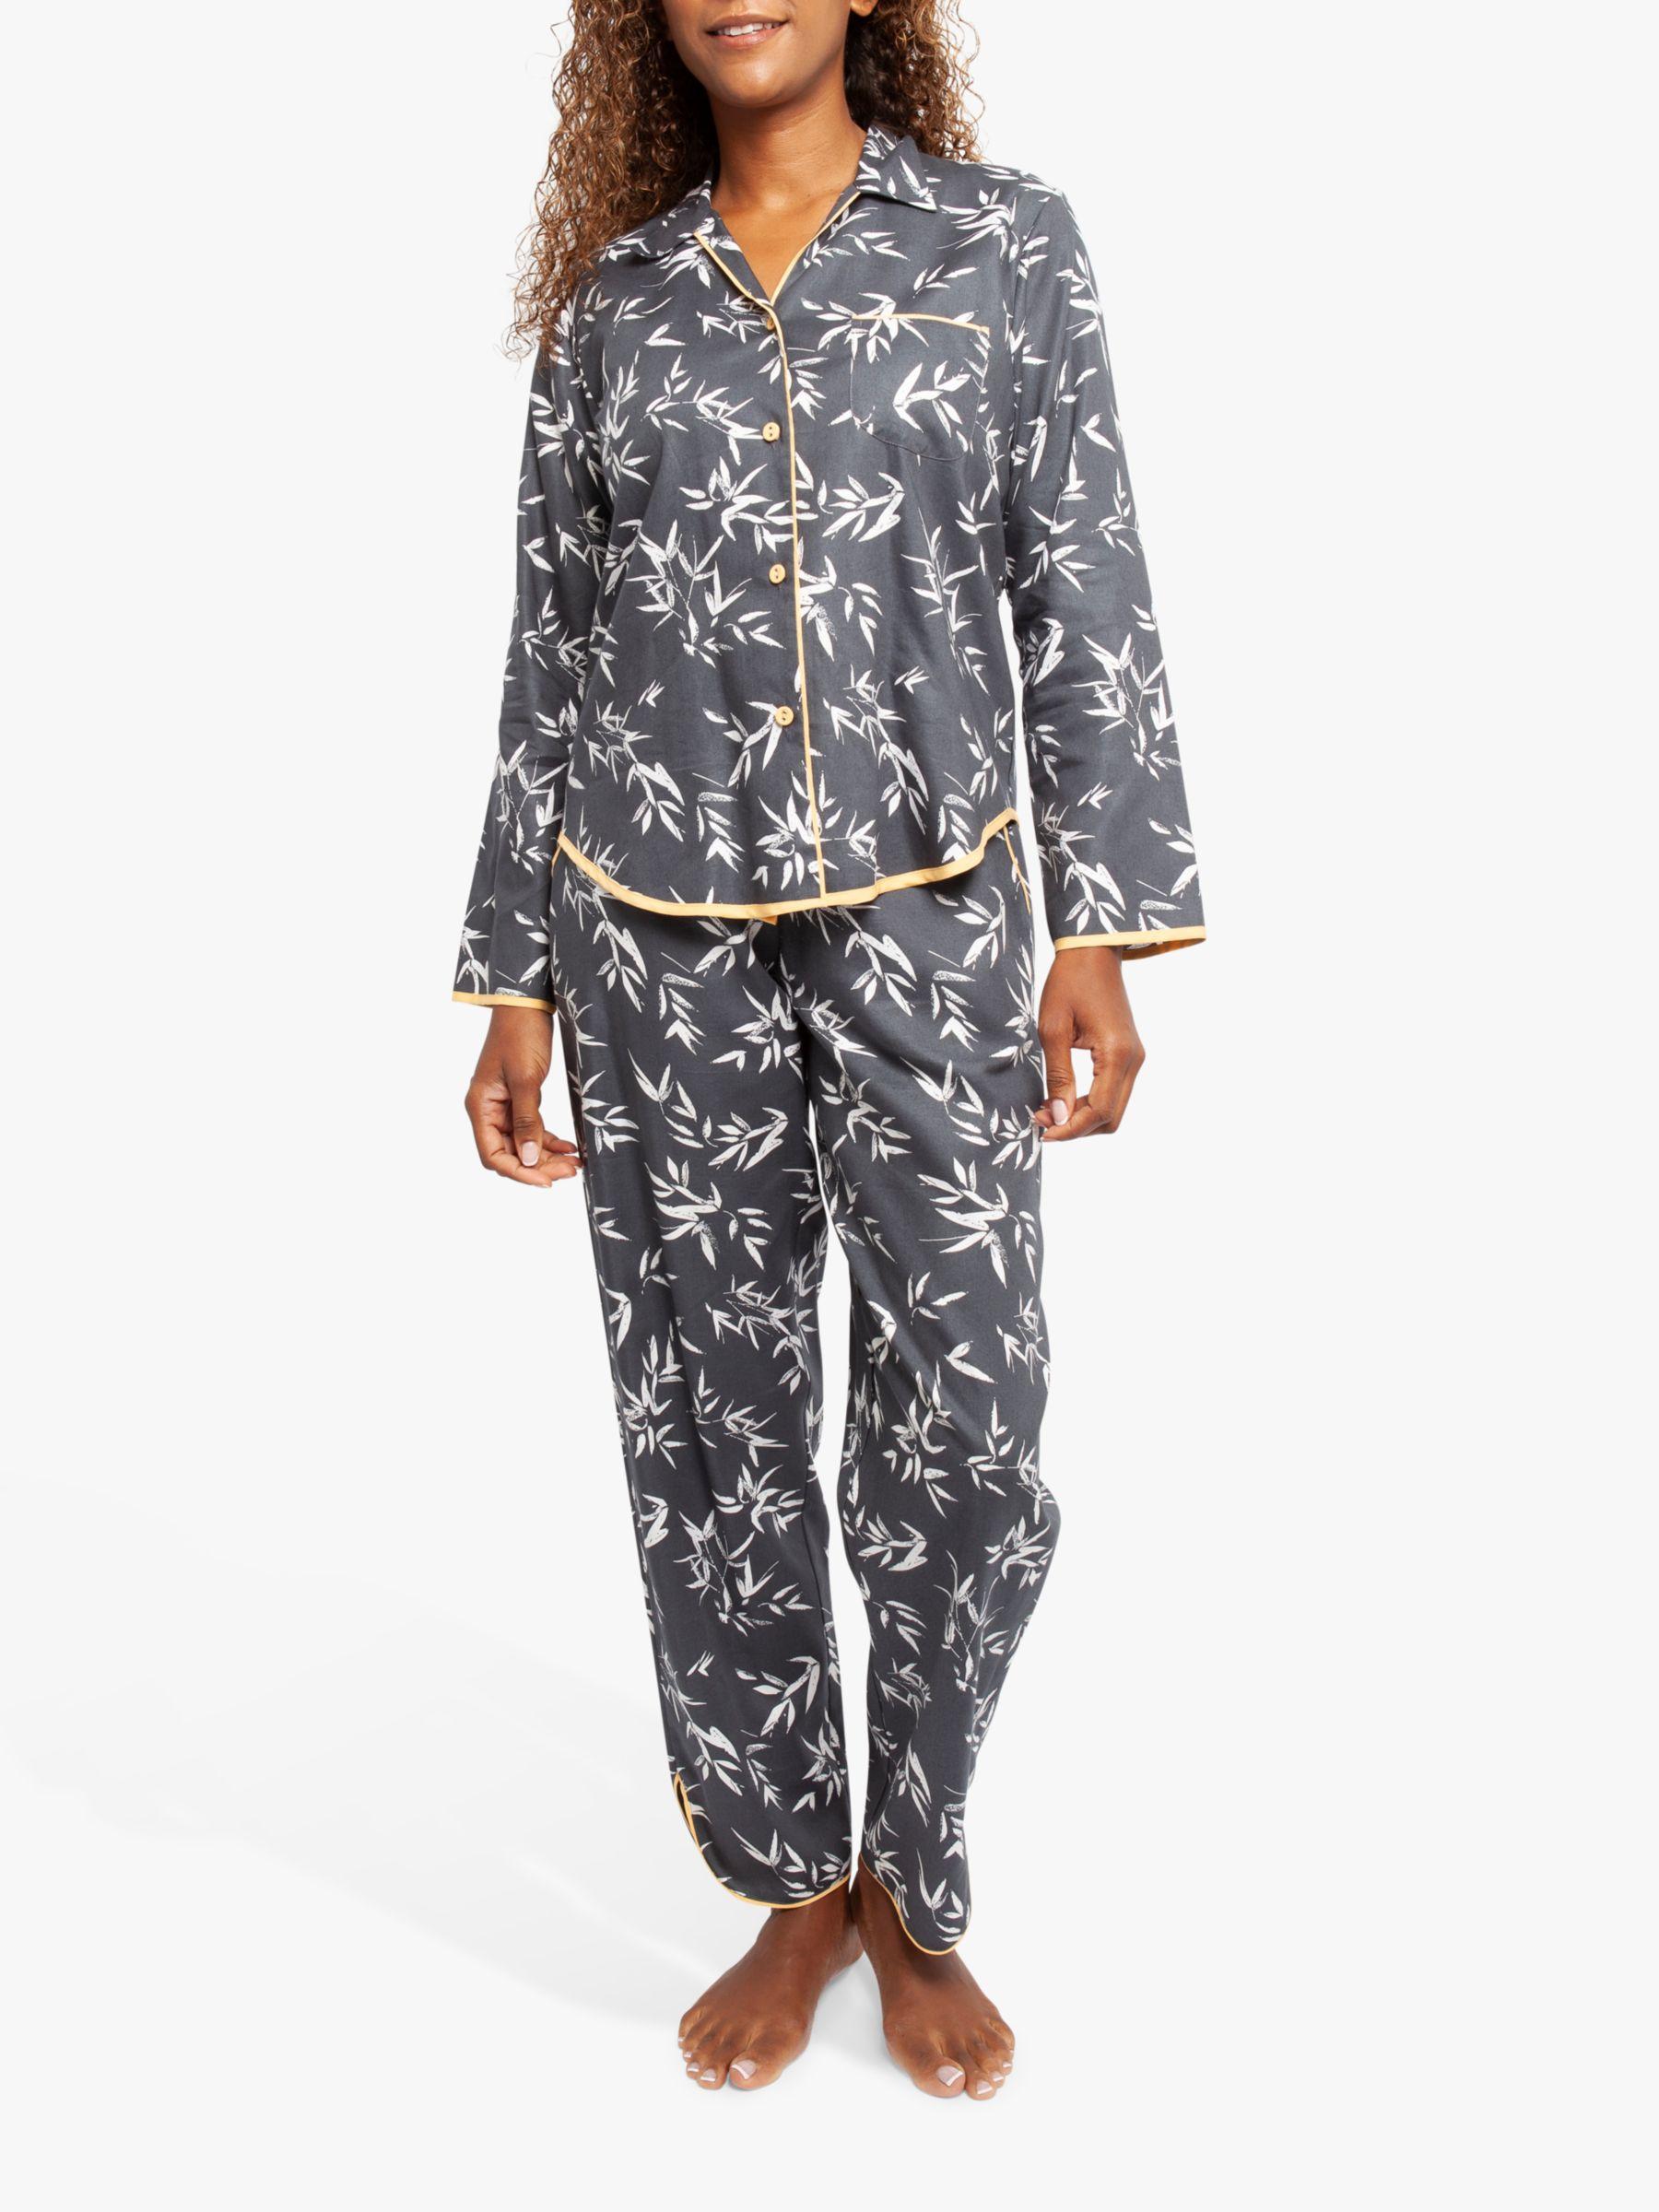 Cyberjammies Cyberjammies Willow Leaf Print Pyjama Set, Grey